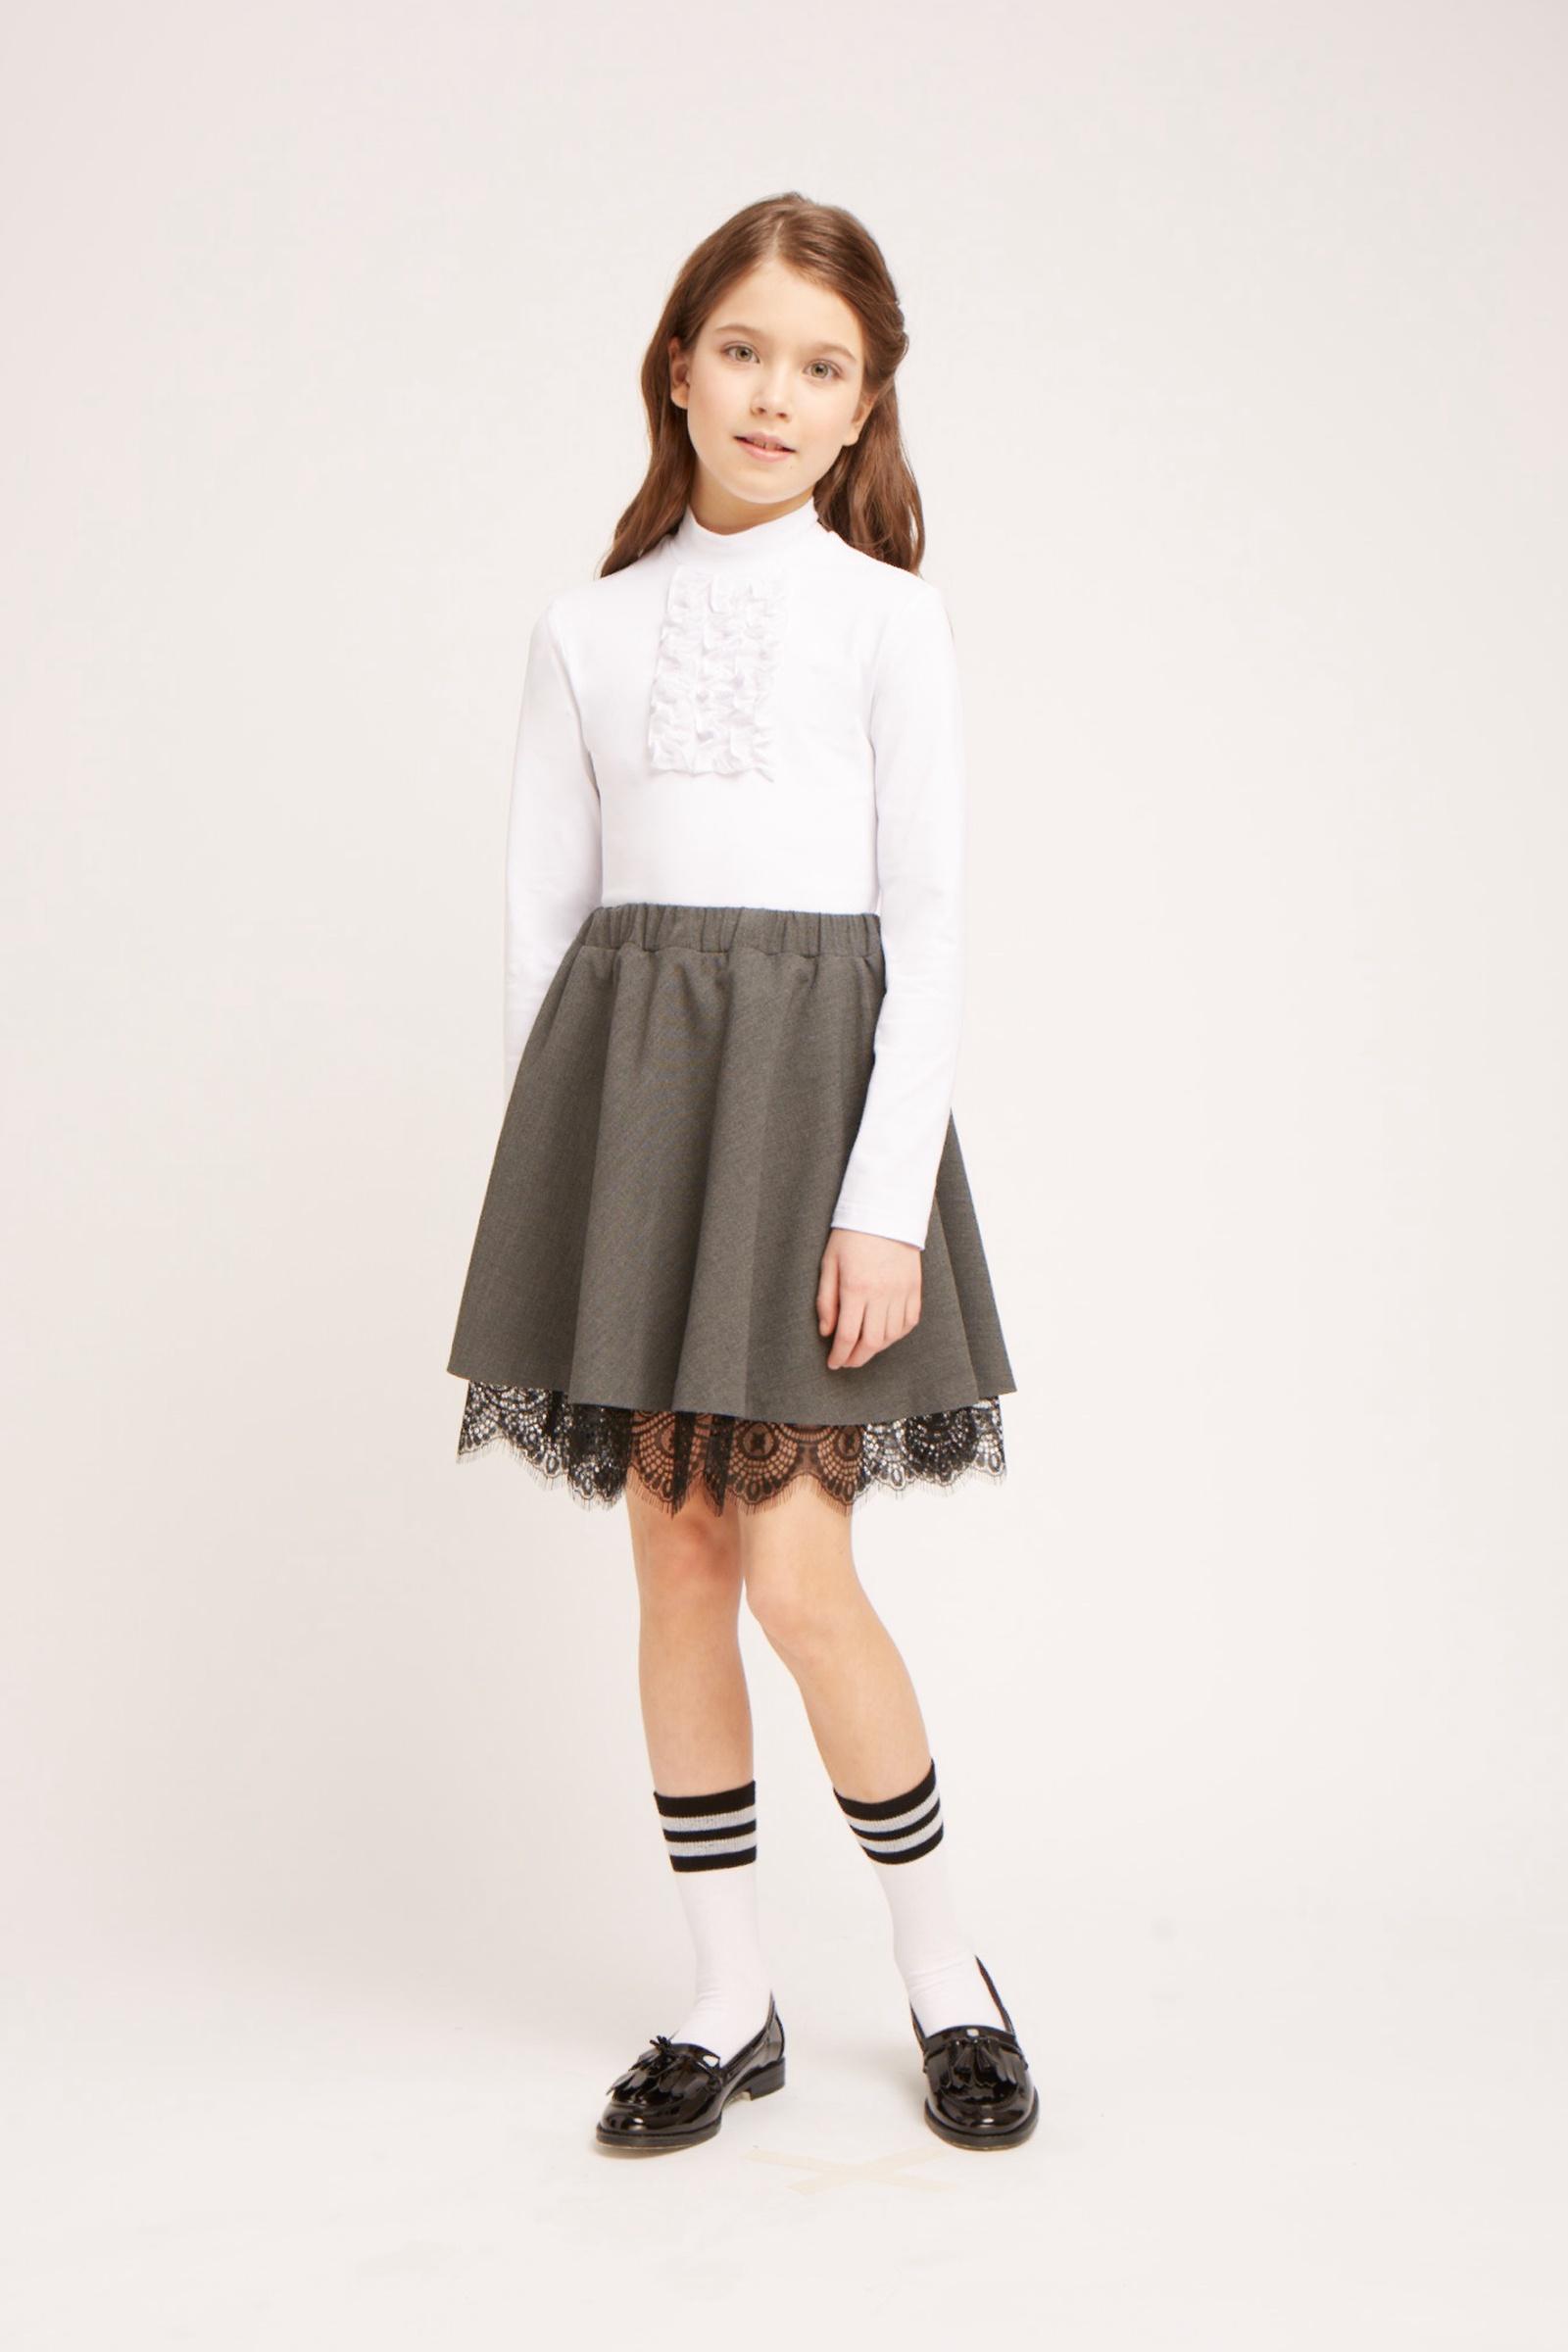 Фото - Блузка Смена блузка для девочки смена цвет белый 16с709 00 размер 158 164